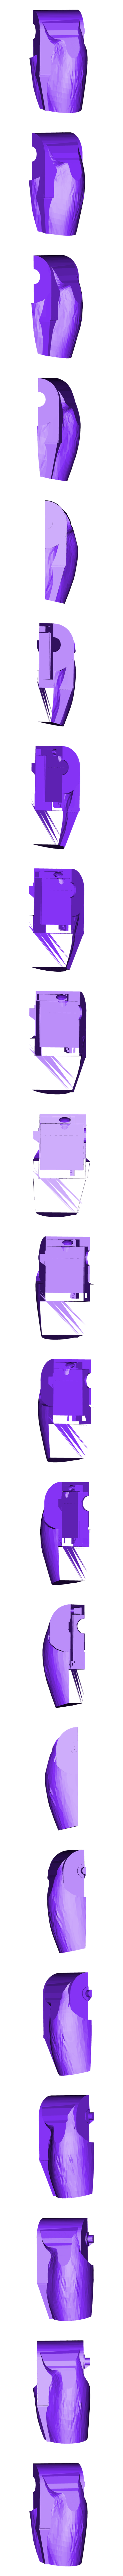 GADGETS  (left) FOREARM pt3 4 PRINT.stl Download free STL file GADGET the robotic Gremlin • 3D printing object, atarka3